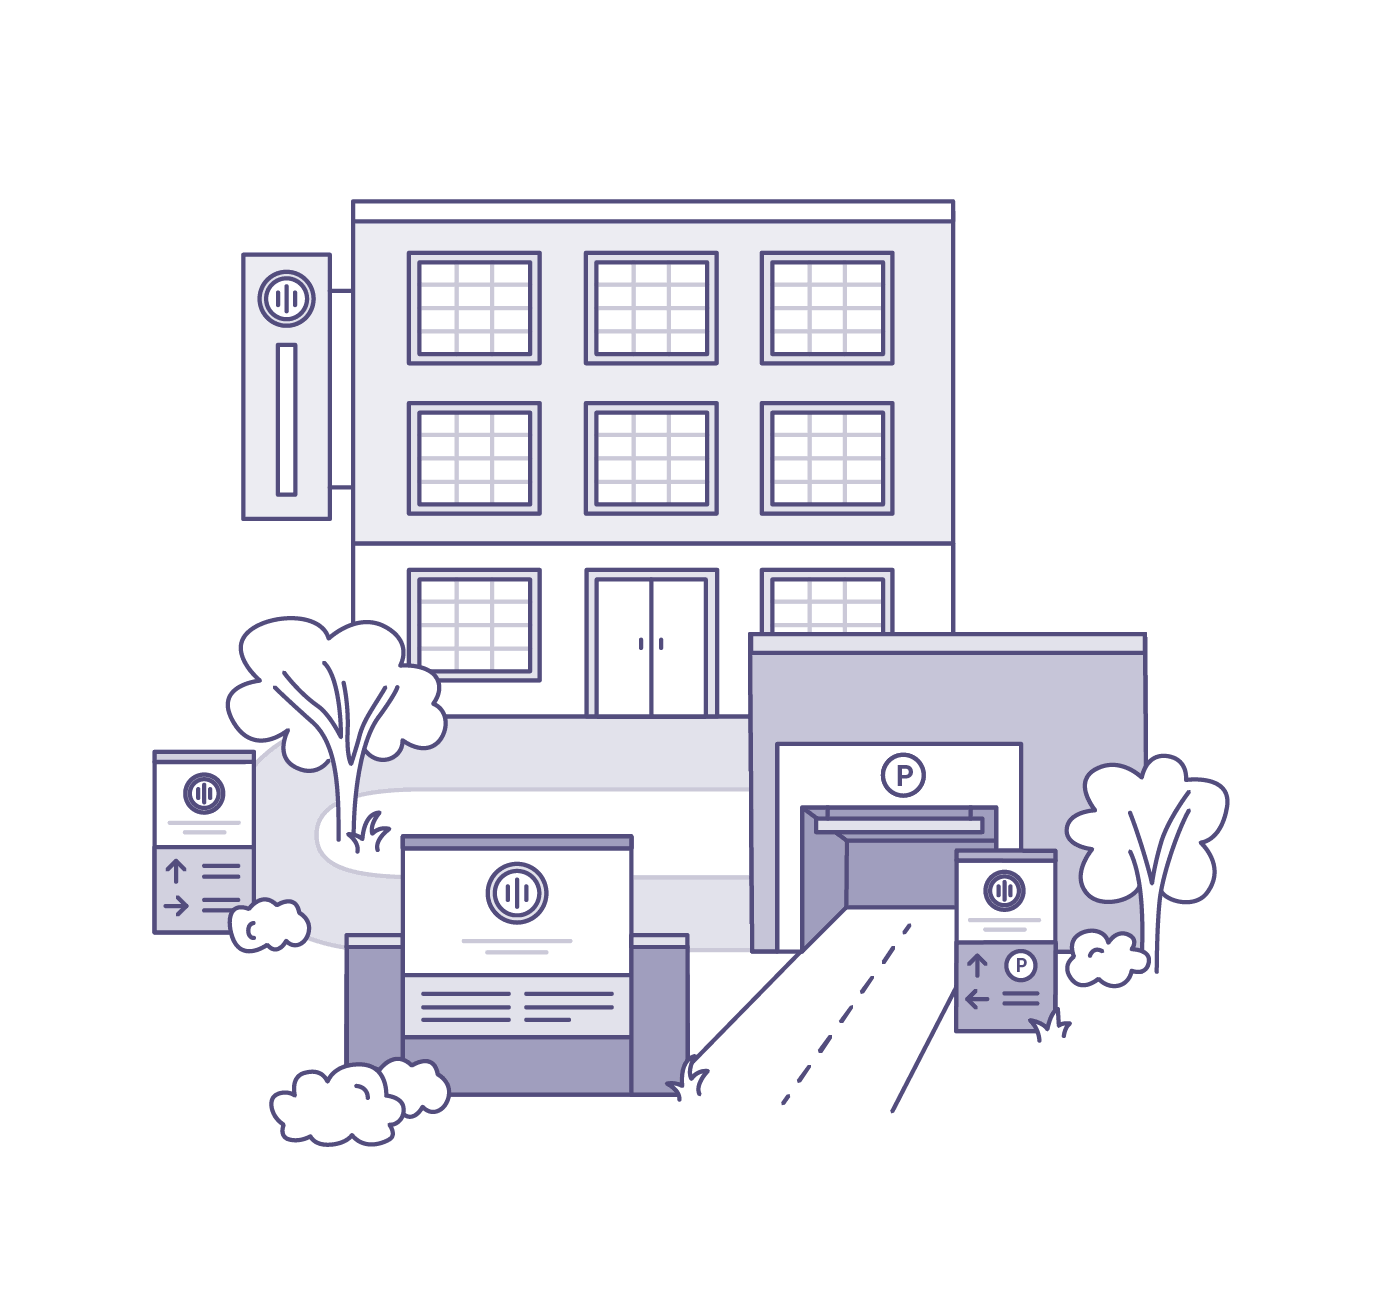 Nimble. Website | Illustrations | Services | Updated 09.30.19_Signage-Wayfinding.png